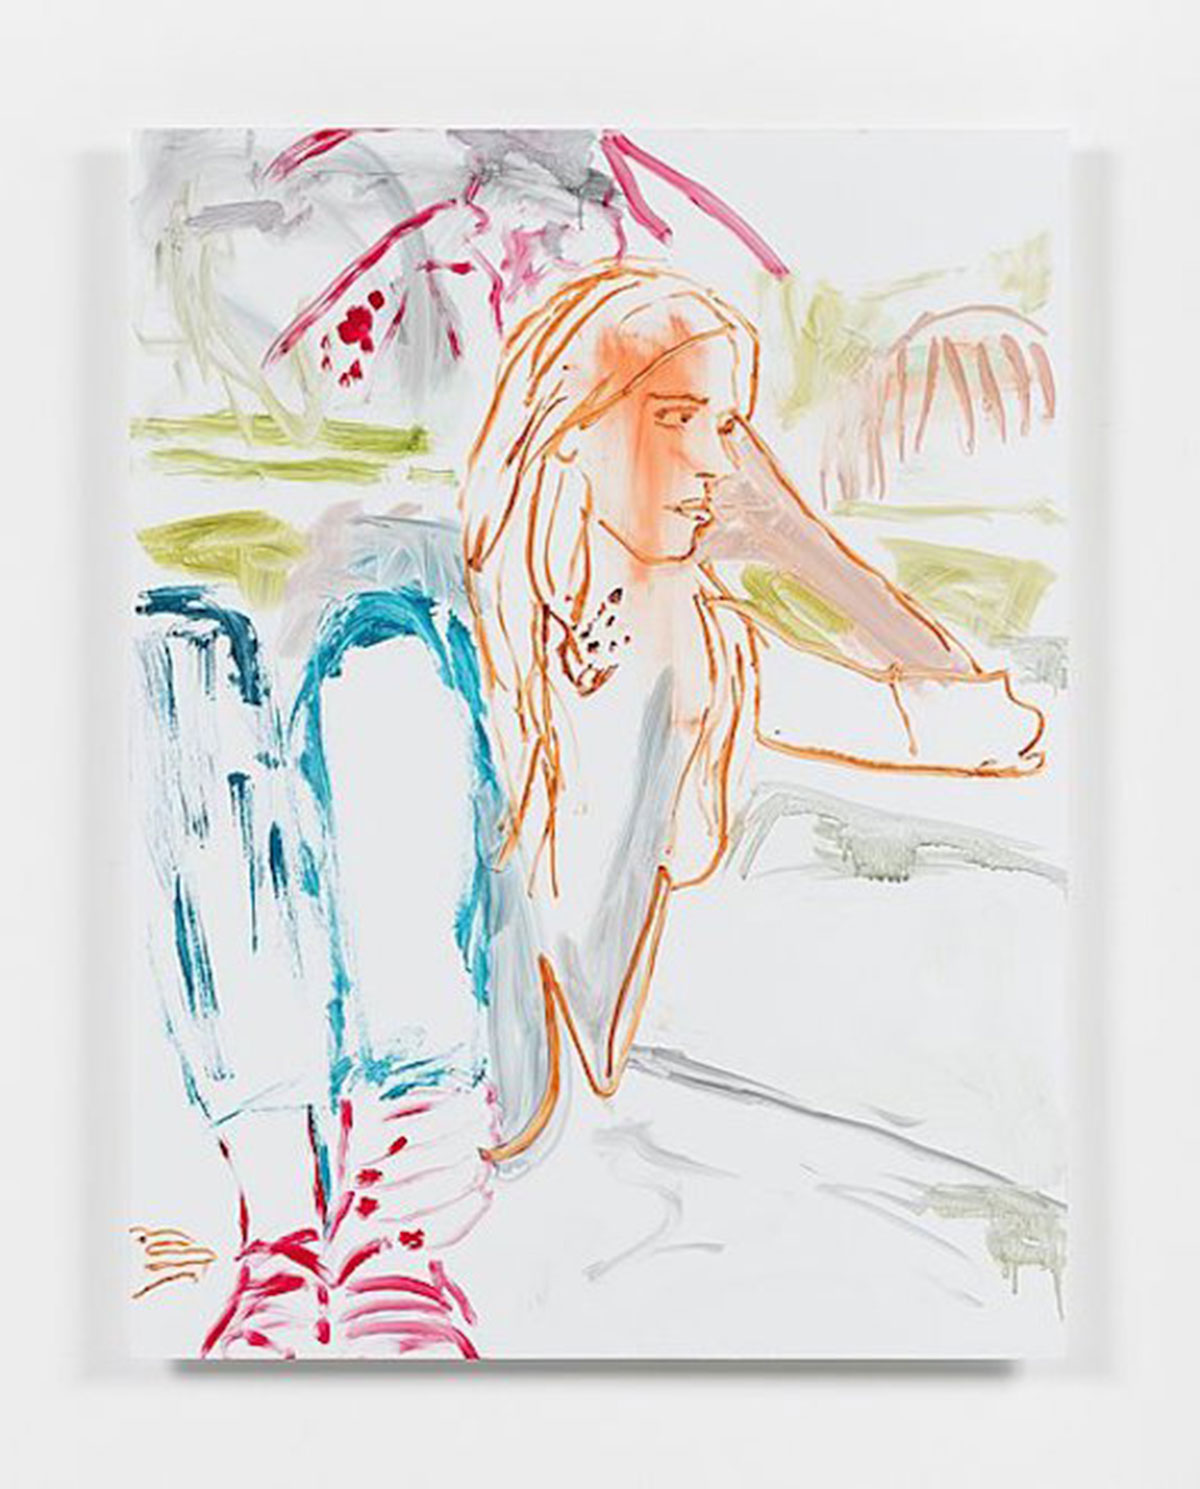 Reena Spaulings, Advisors, Detail 1 (Eleanor Cayre), 2016, Acrylfarbe auf Dibond, 86,4 x 66 cm, © Courtesy of the artist, Private Sammlung und Campoli Presti, London/Paris